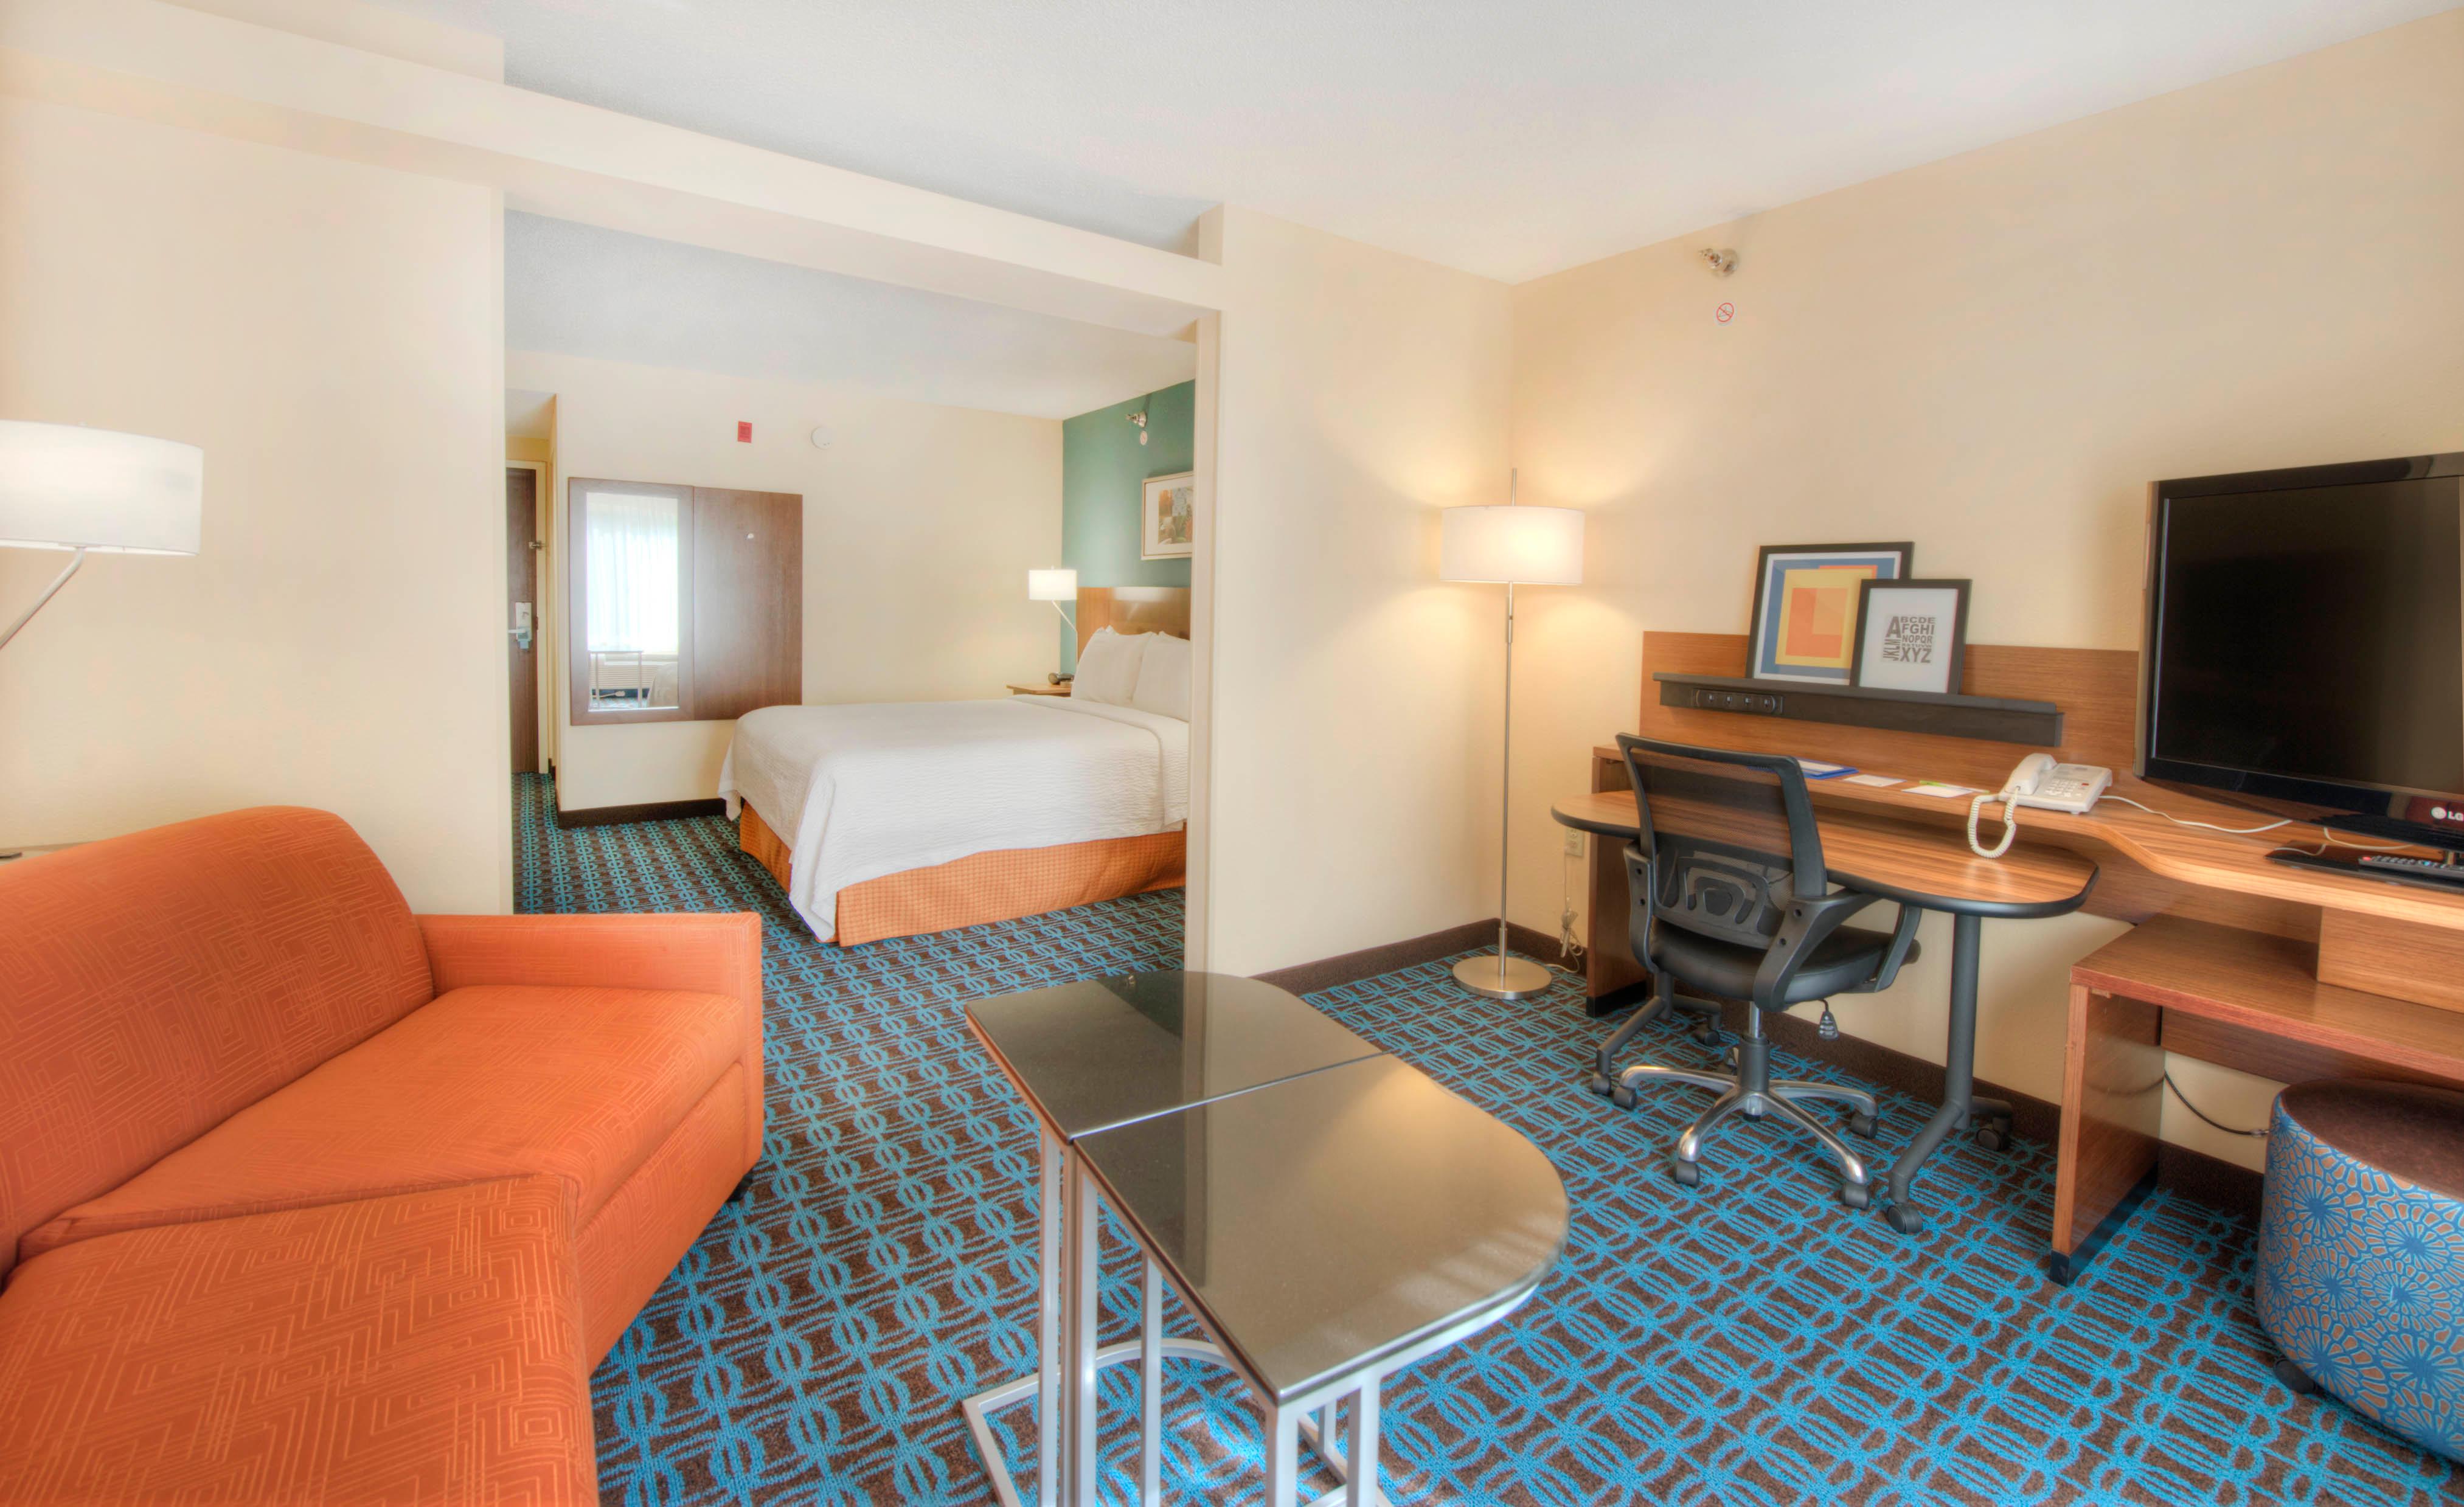 Fairfield Inn & Suites by Marriott Raleigh Crabtree Valley image 5